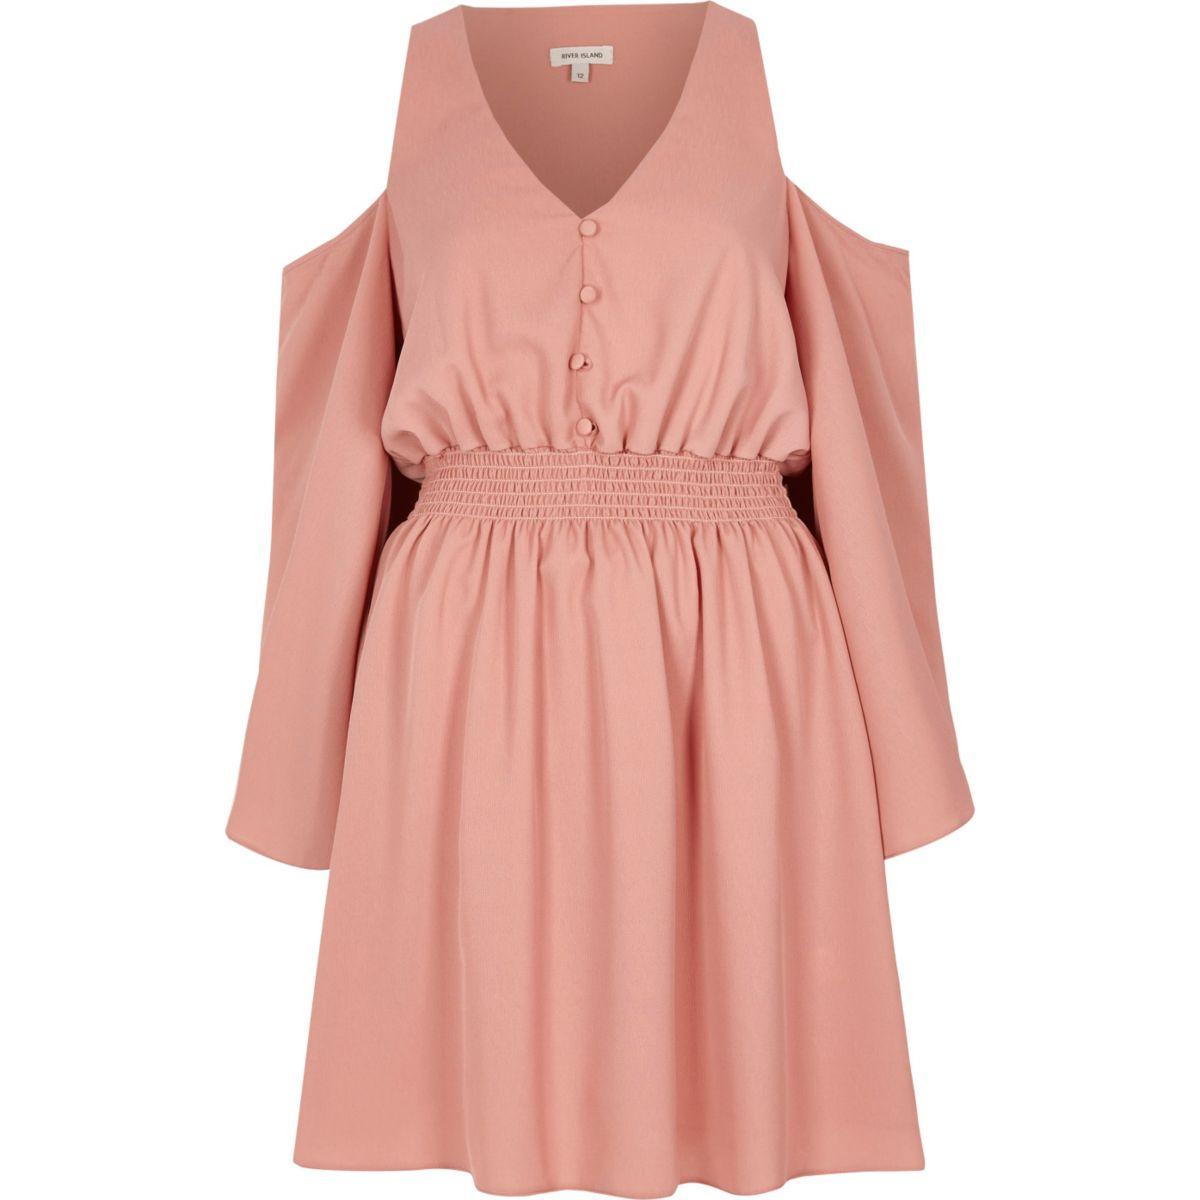 Pink cold shoulder button front dress